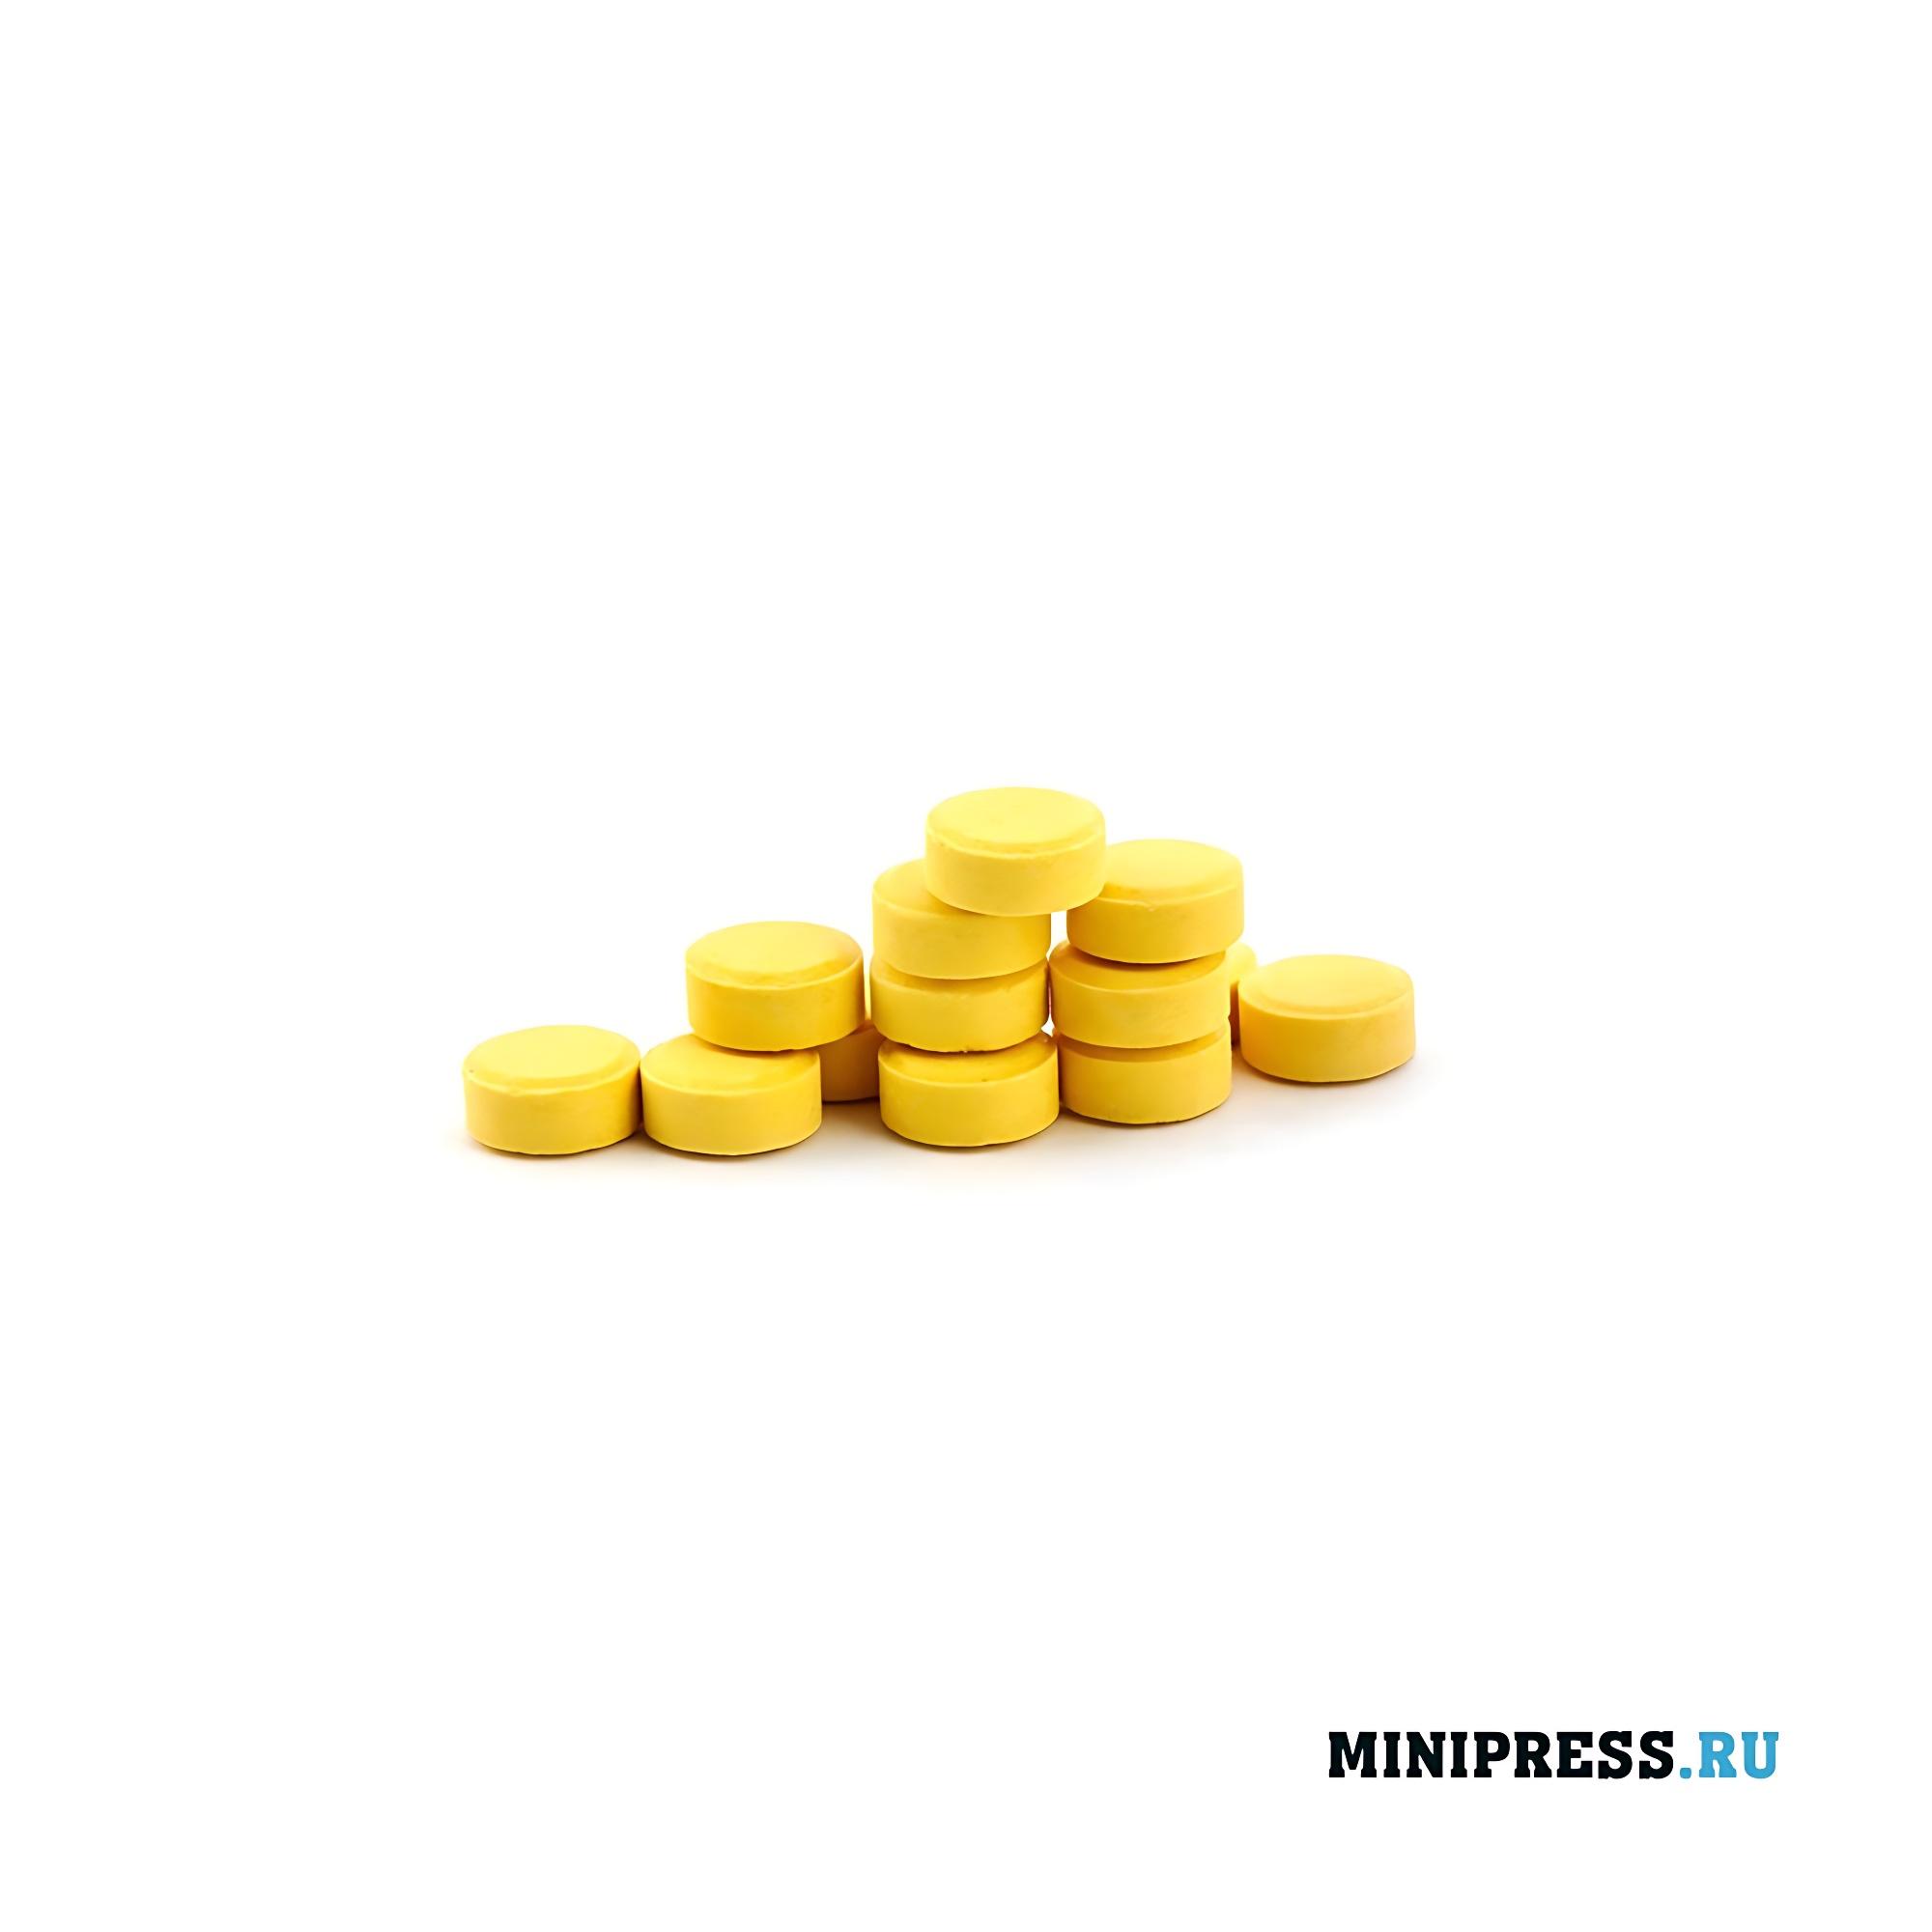 Прессование таблеток